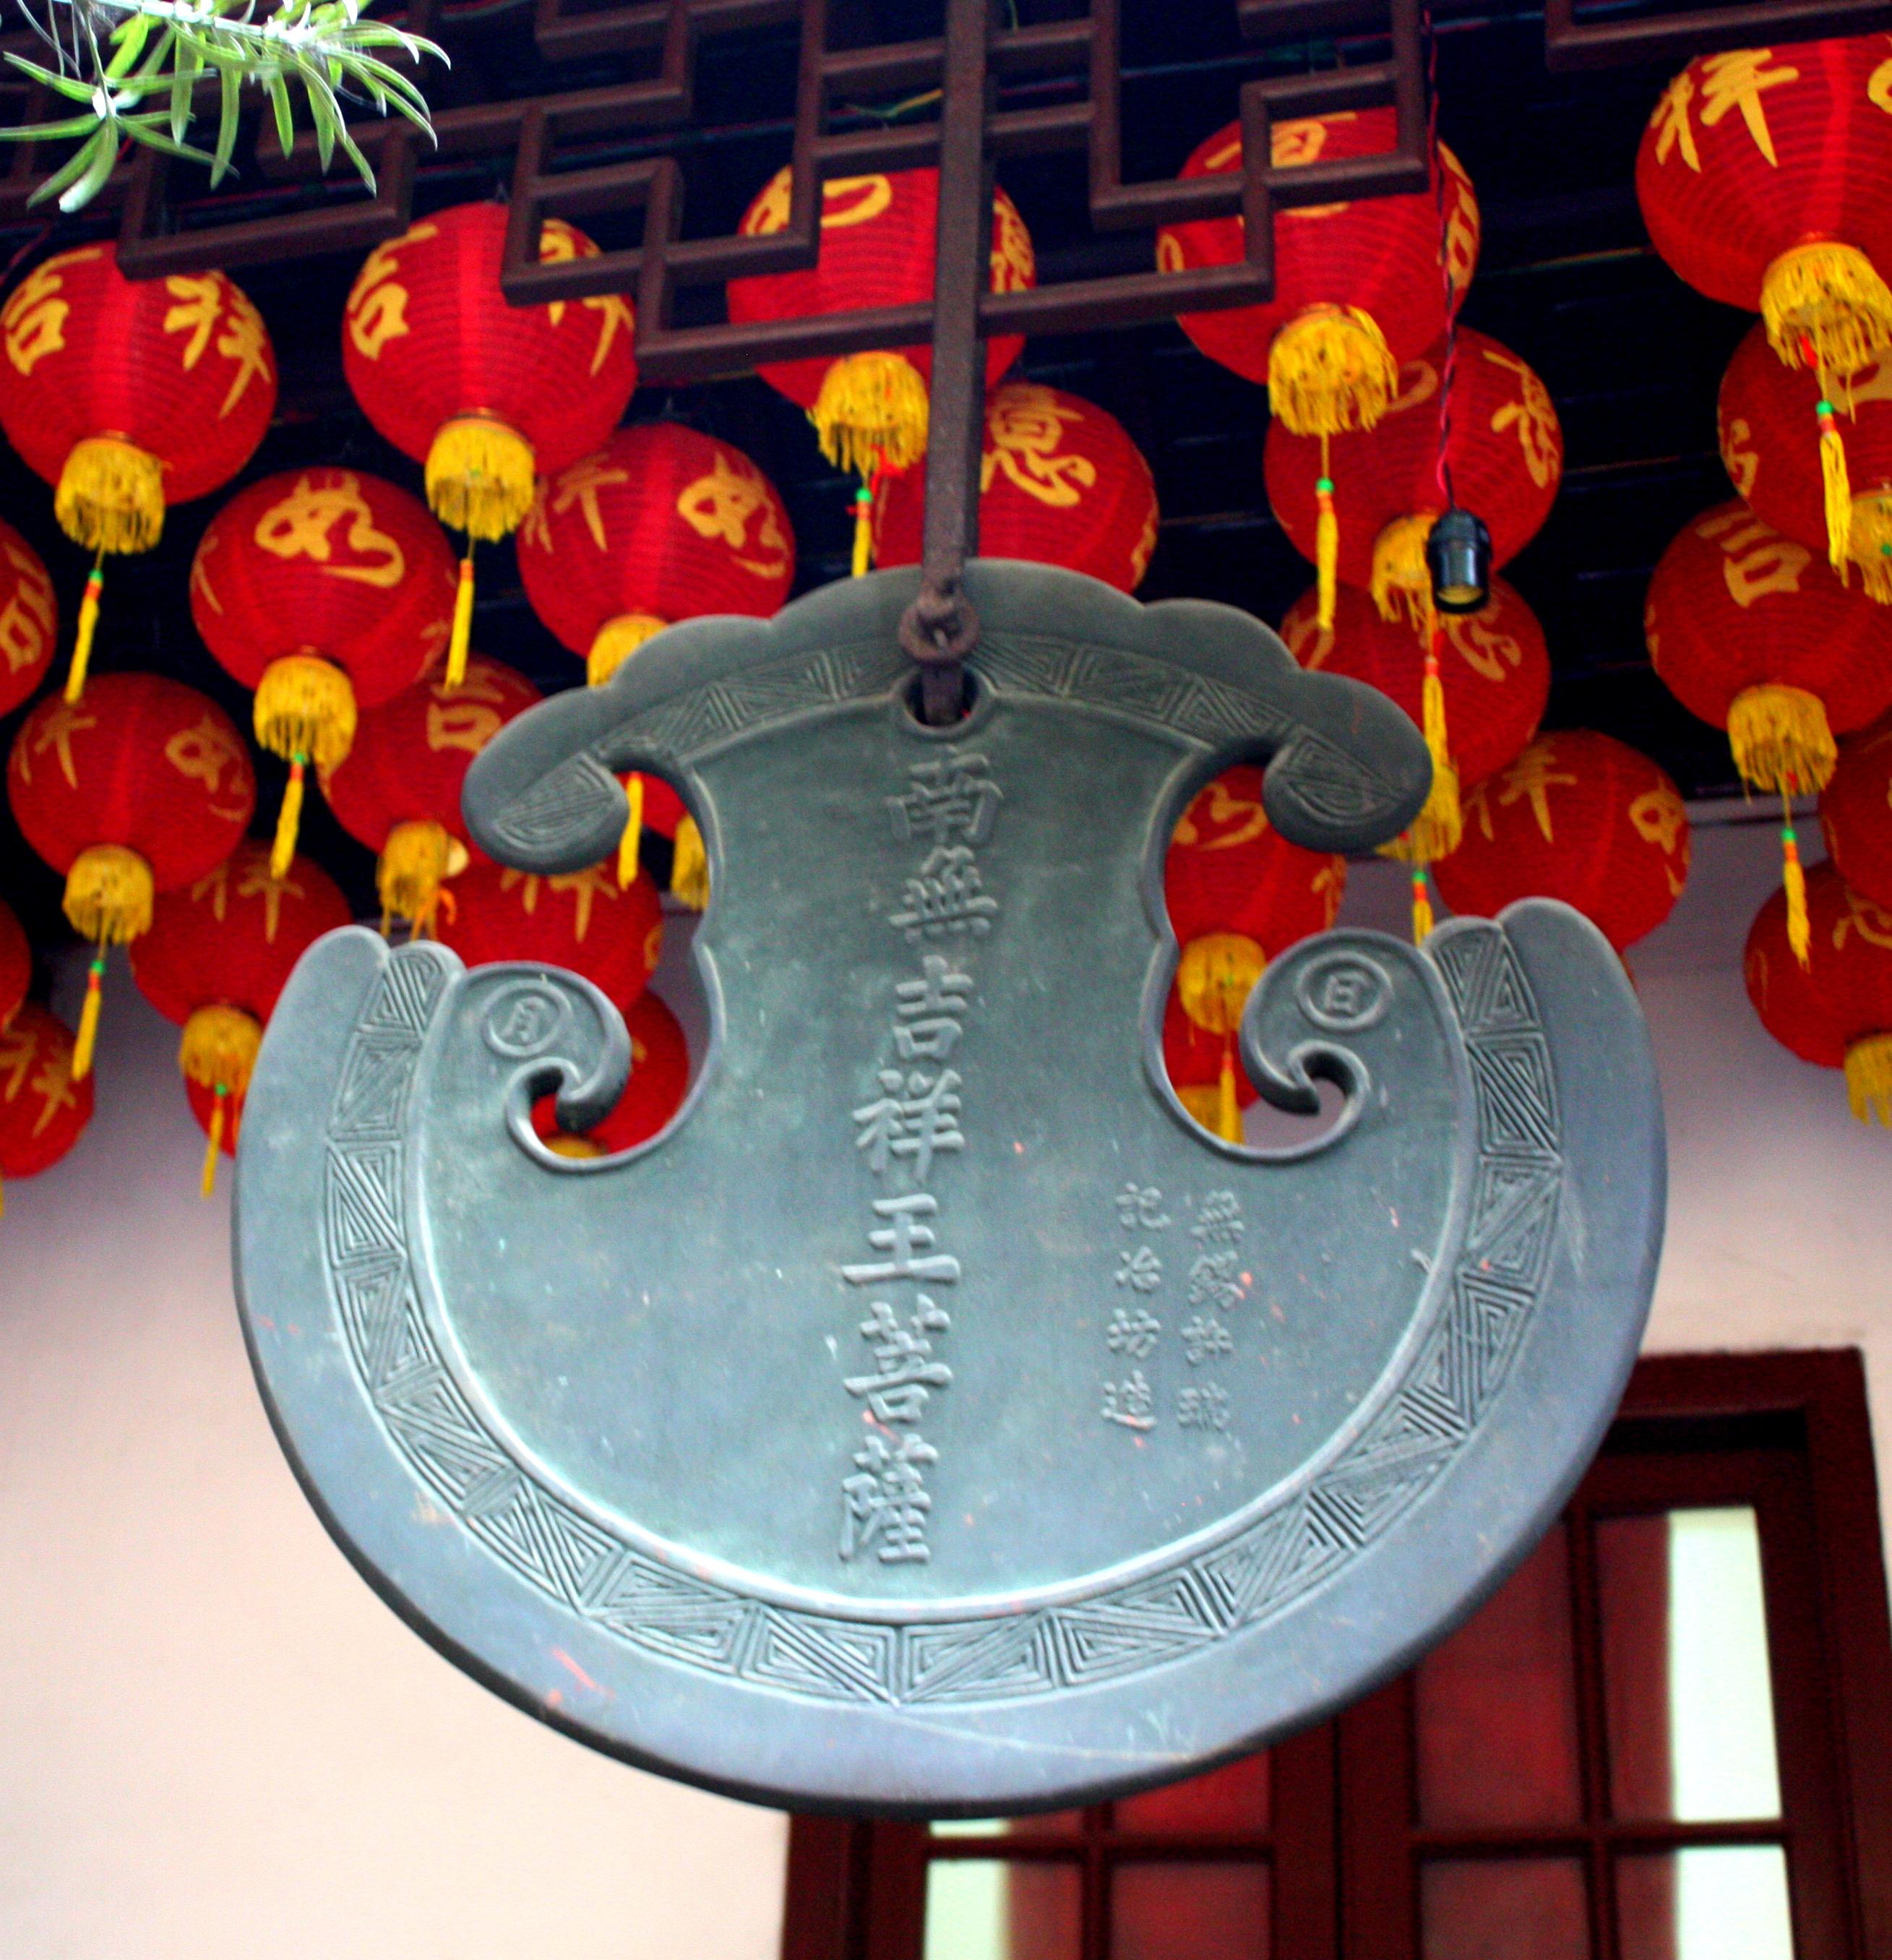 Chinese buddhism jade buddha temple antonio rambls travels everything in china seems to carry symbolic meaning buycottarizona Images